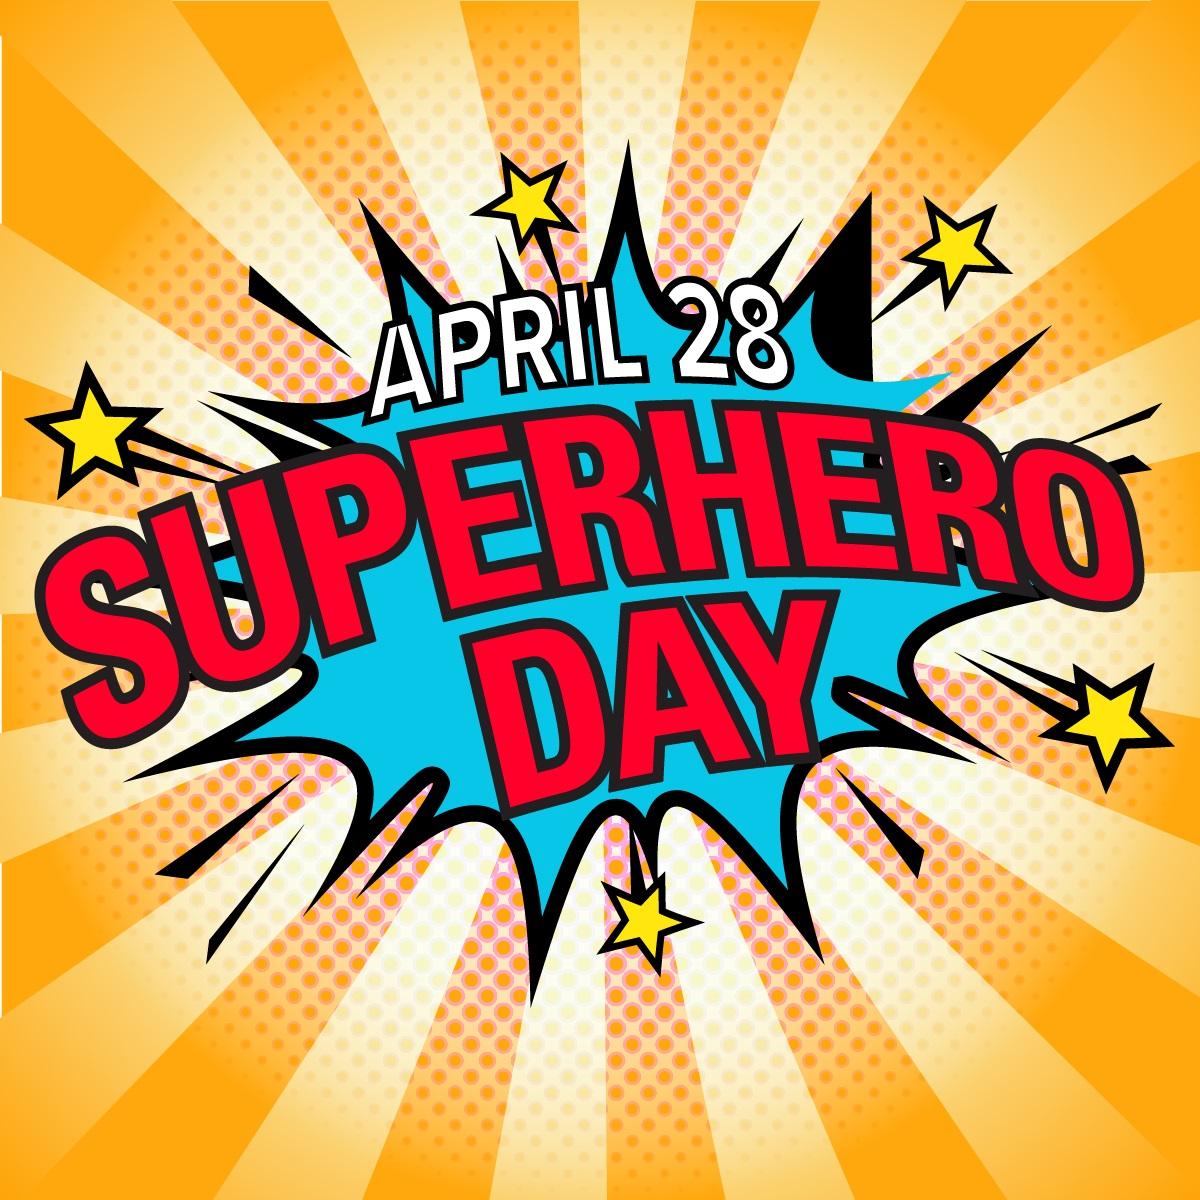 Superhero day splash